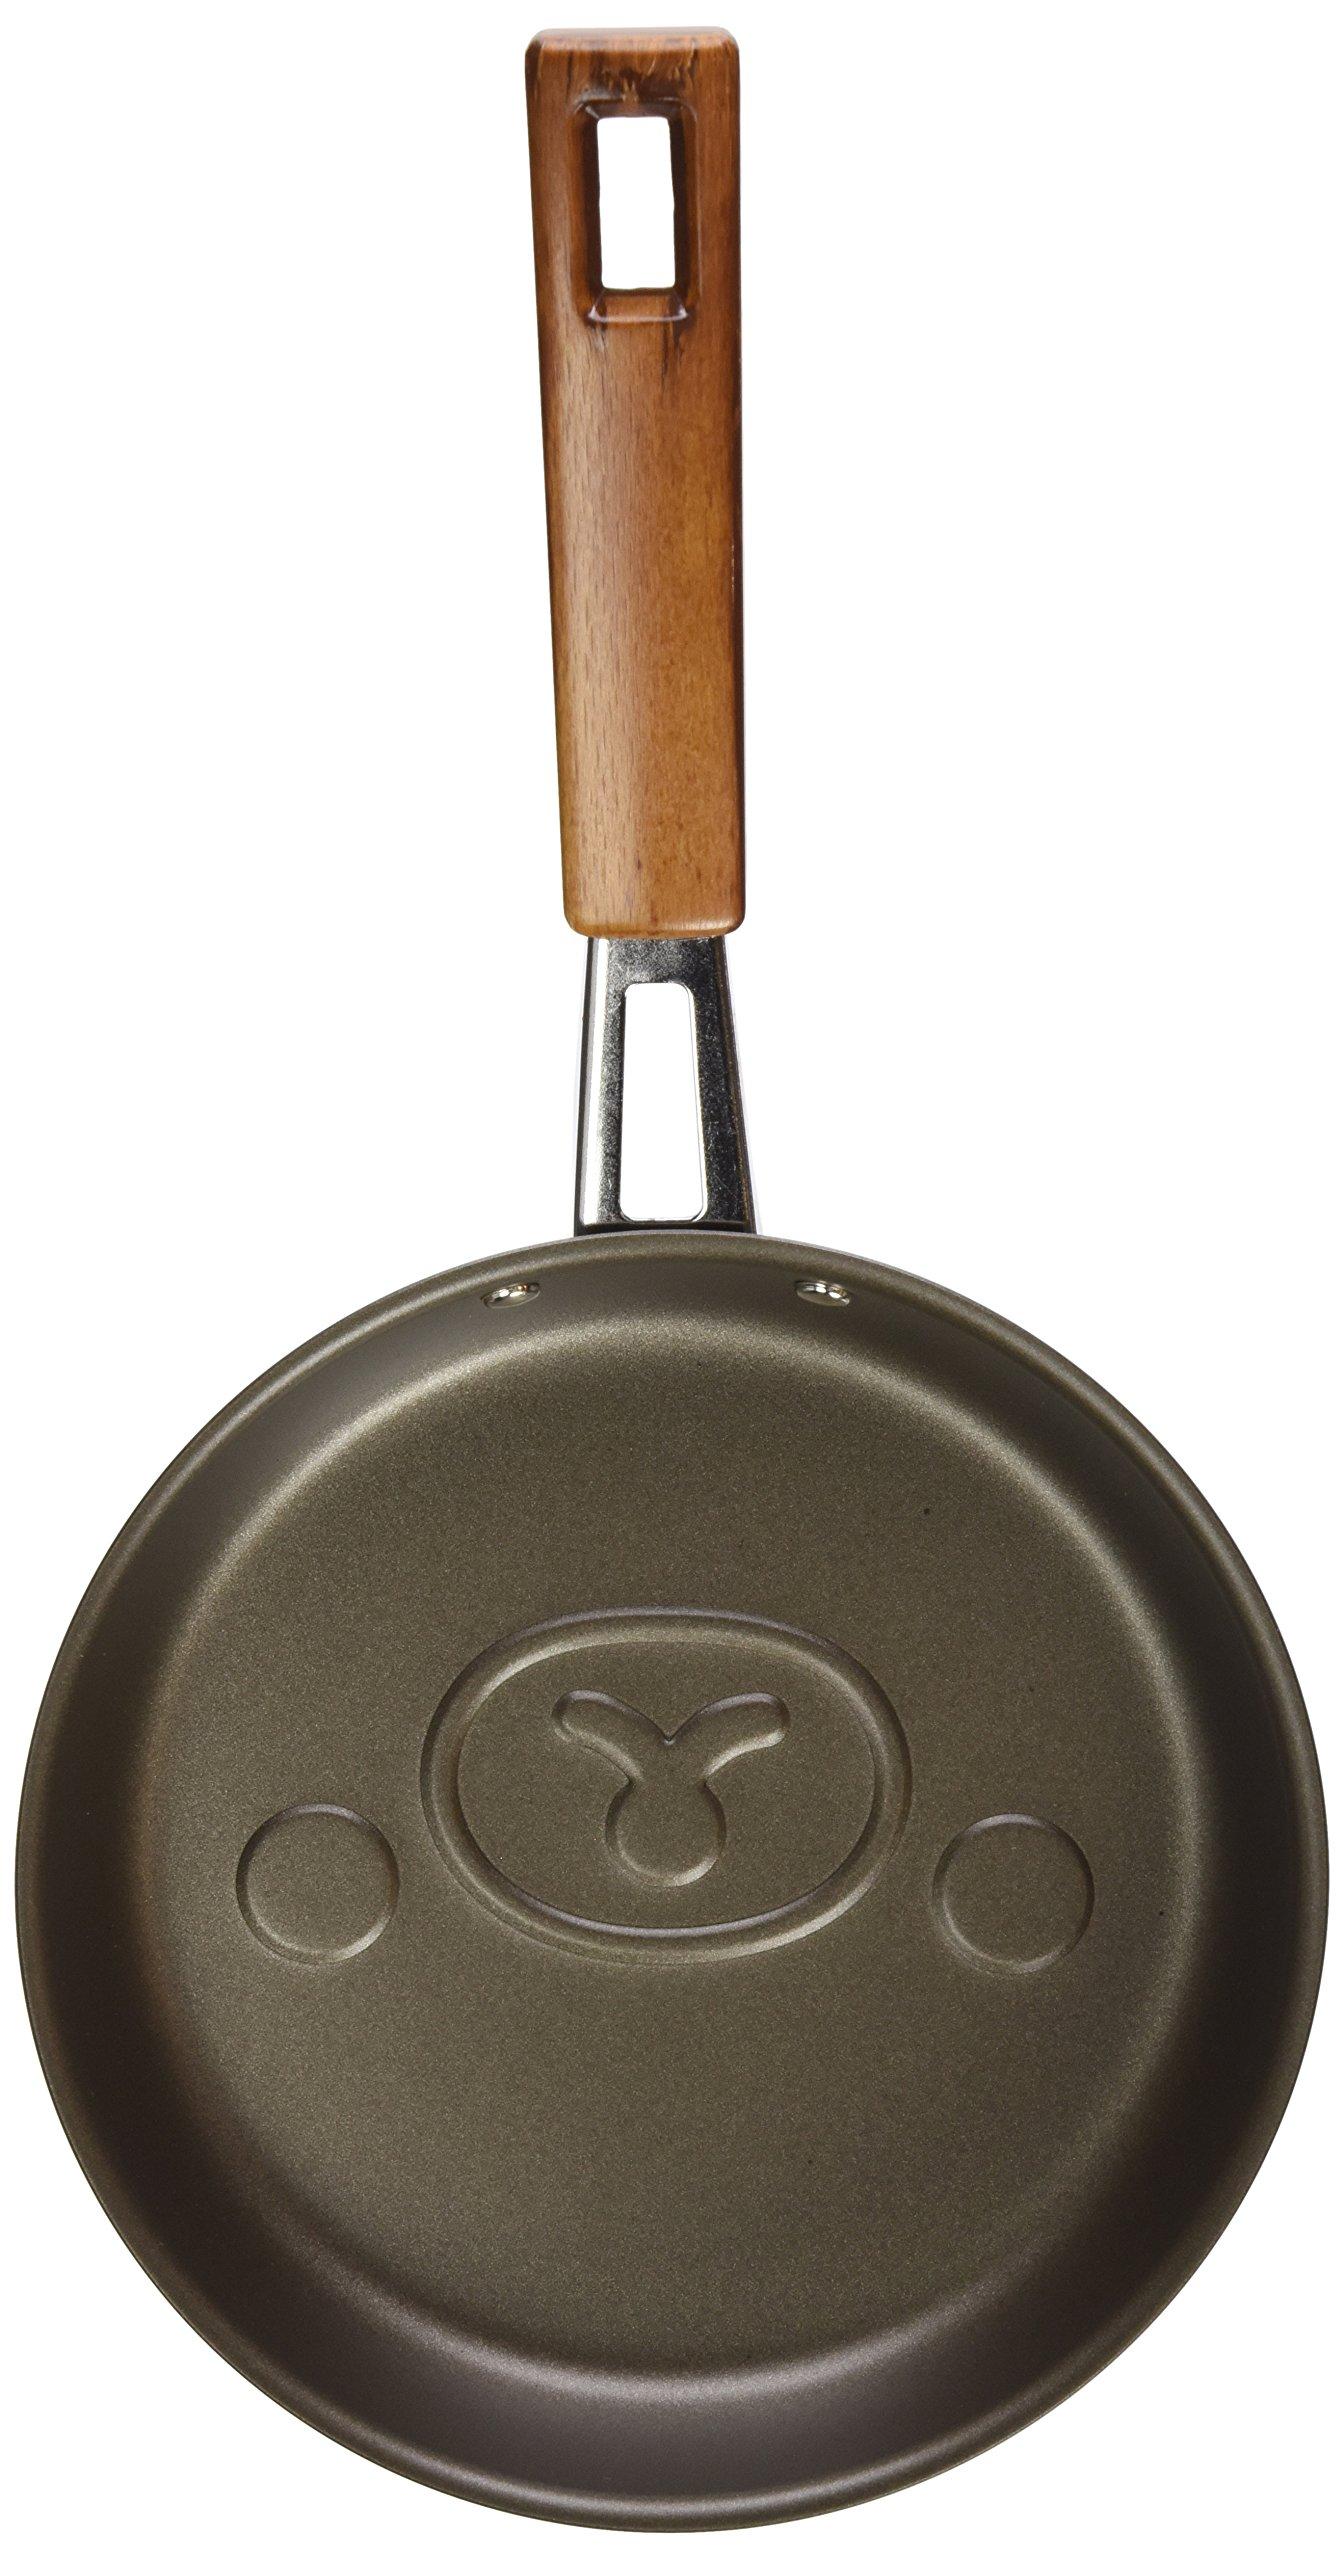 [ Rilakkuma ] pancake bread š kitchen goods š